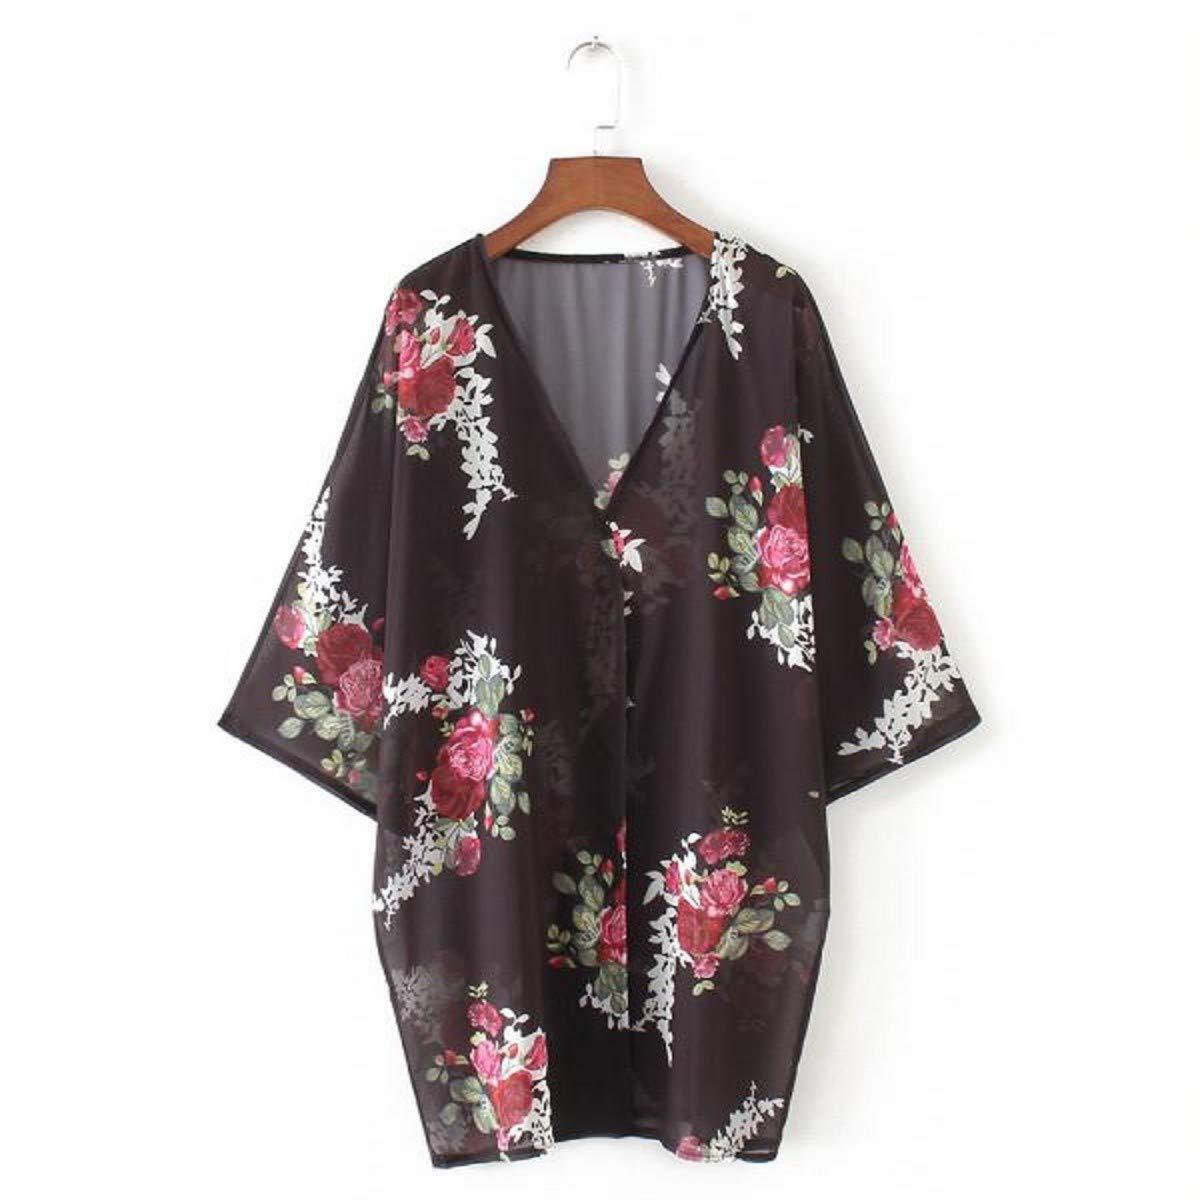 OTINICE Women's Chiffon Kimono Cardigans Floral Puff Sleeve Casual Loose Swimwear Cover ups Black by OTINICE (Image #3)